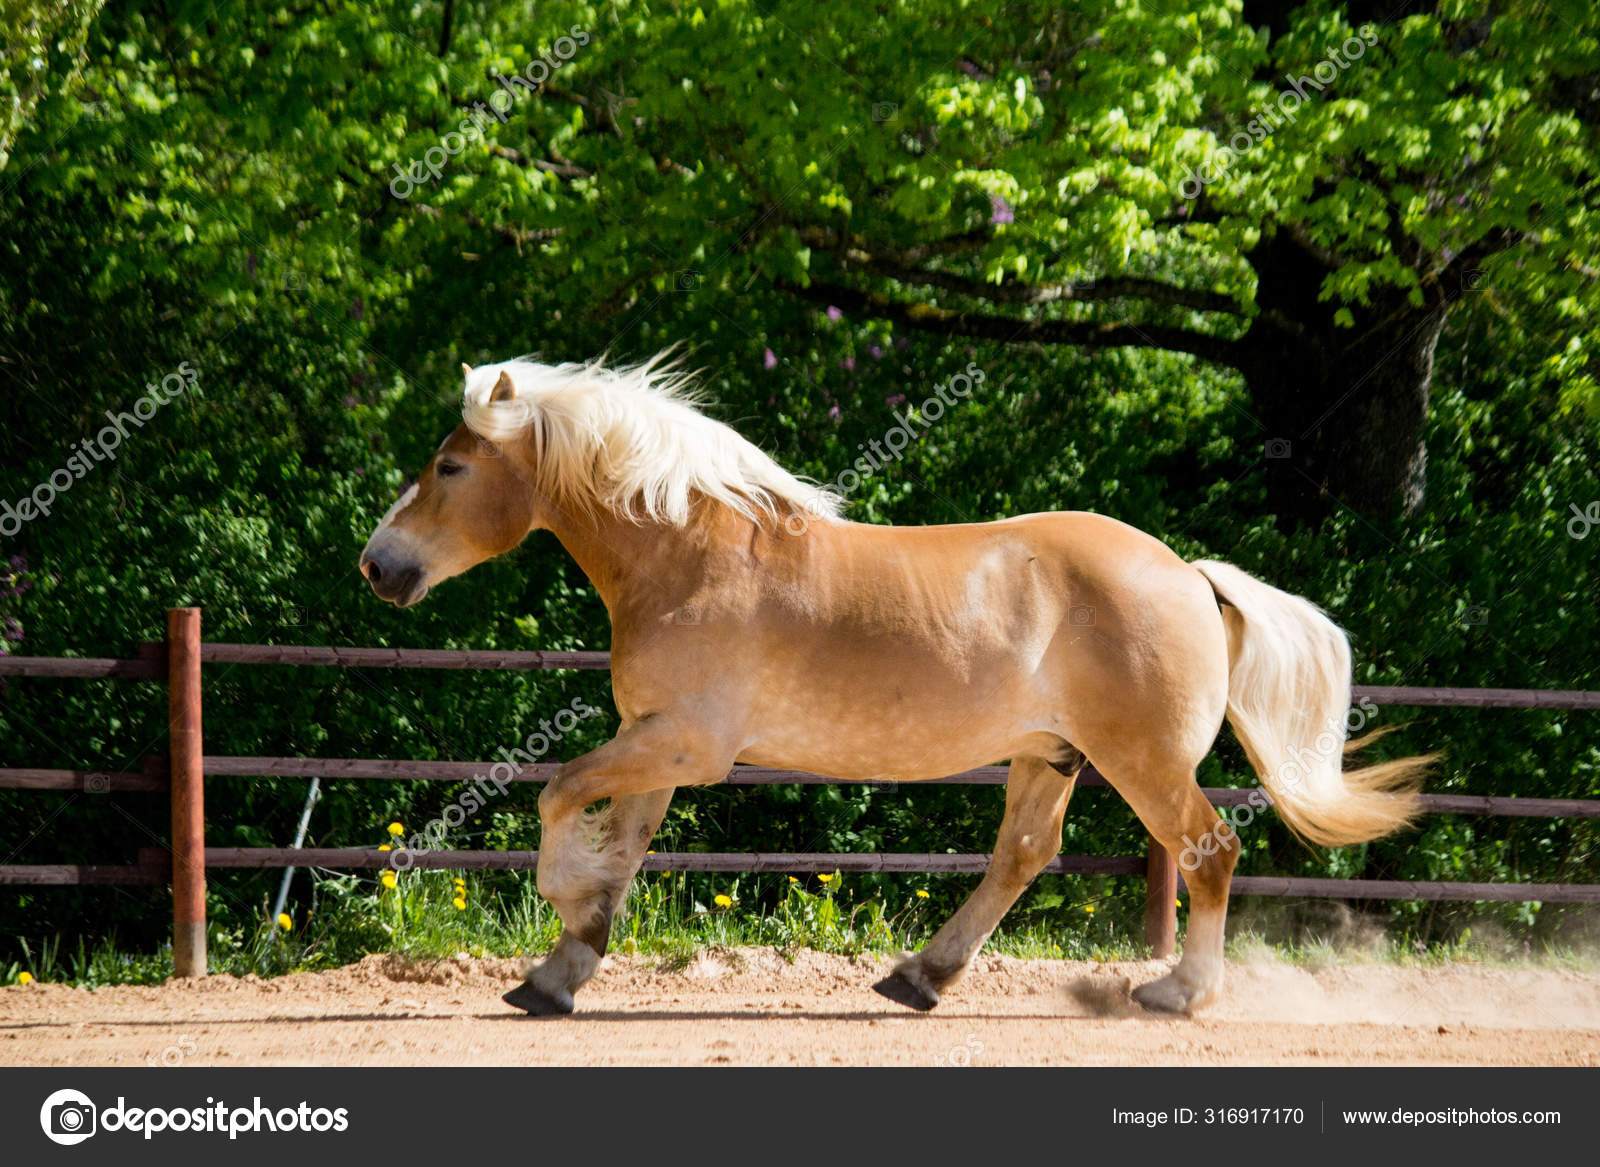 Beautiful Big Palomino Draft Horse Galloping Free Stock Photo C Virgonira 316917170